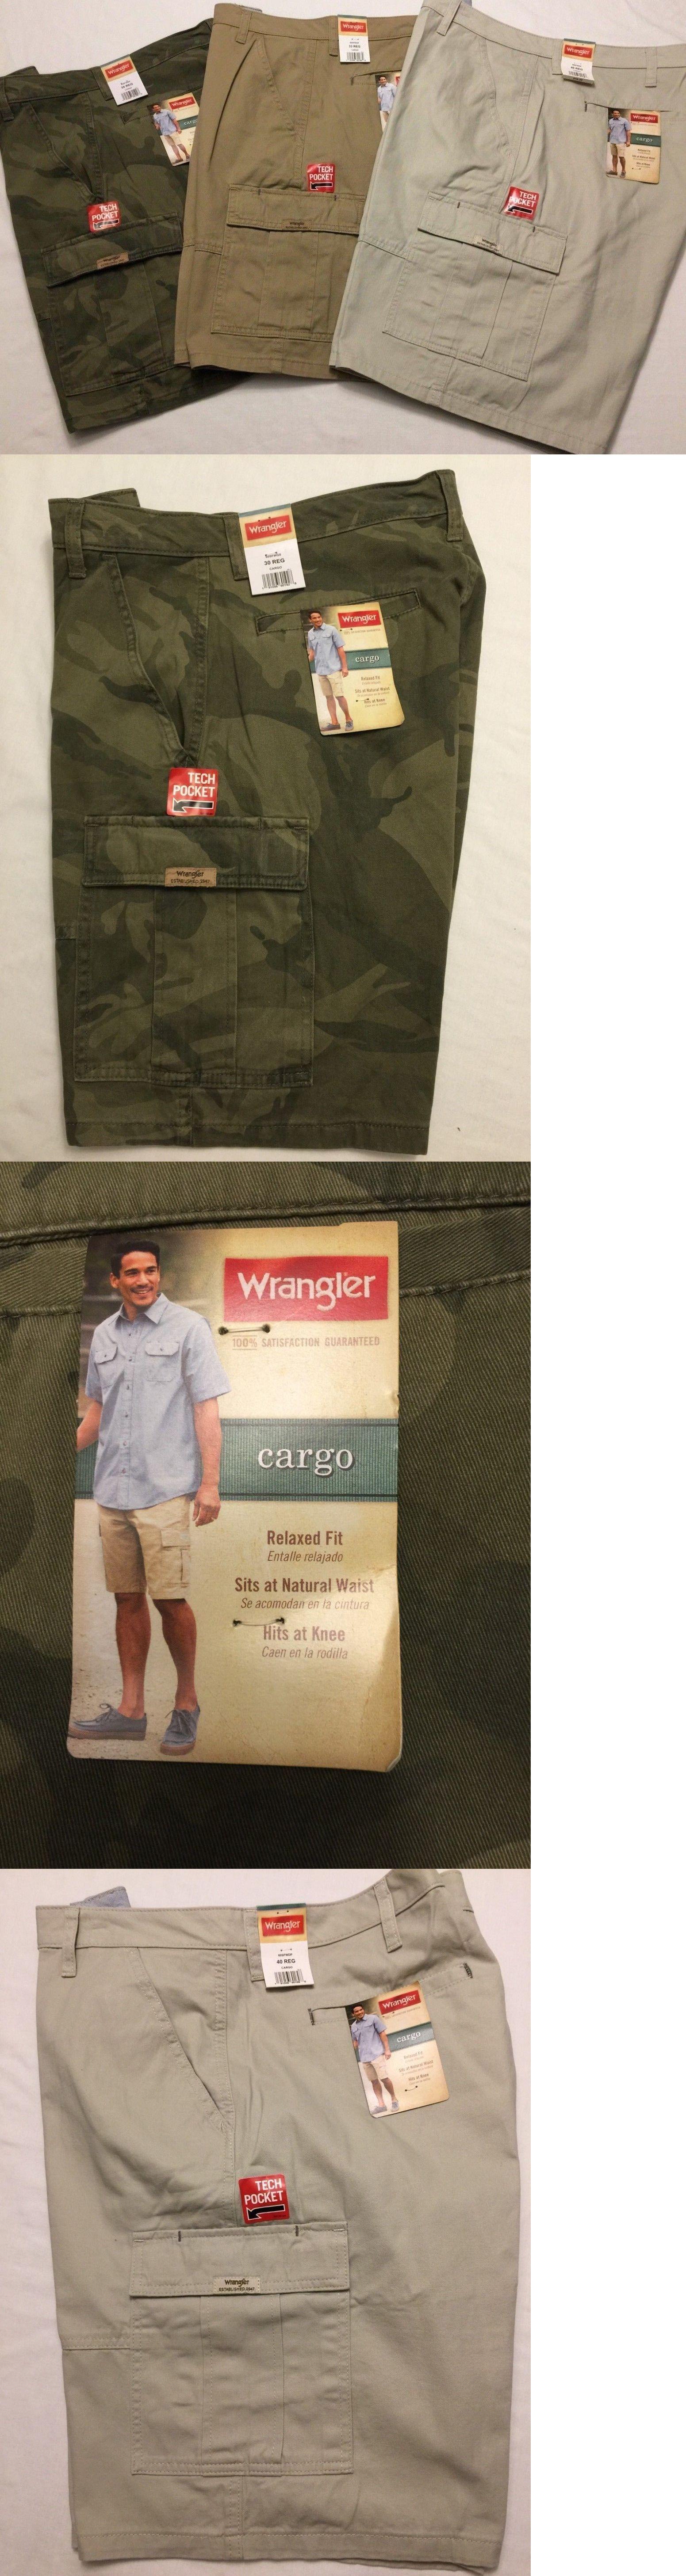 13eb30a180 Shorts 15689: Nwt Wrangler Men S Cargo Shorts Stone Khaki Blue, Green Camo Tech  Pocket Relaxed -> BUY IT NOW ONLY: $27.95 on #eBay #shorts #wrangler #cargo  ...